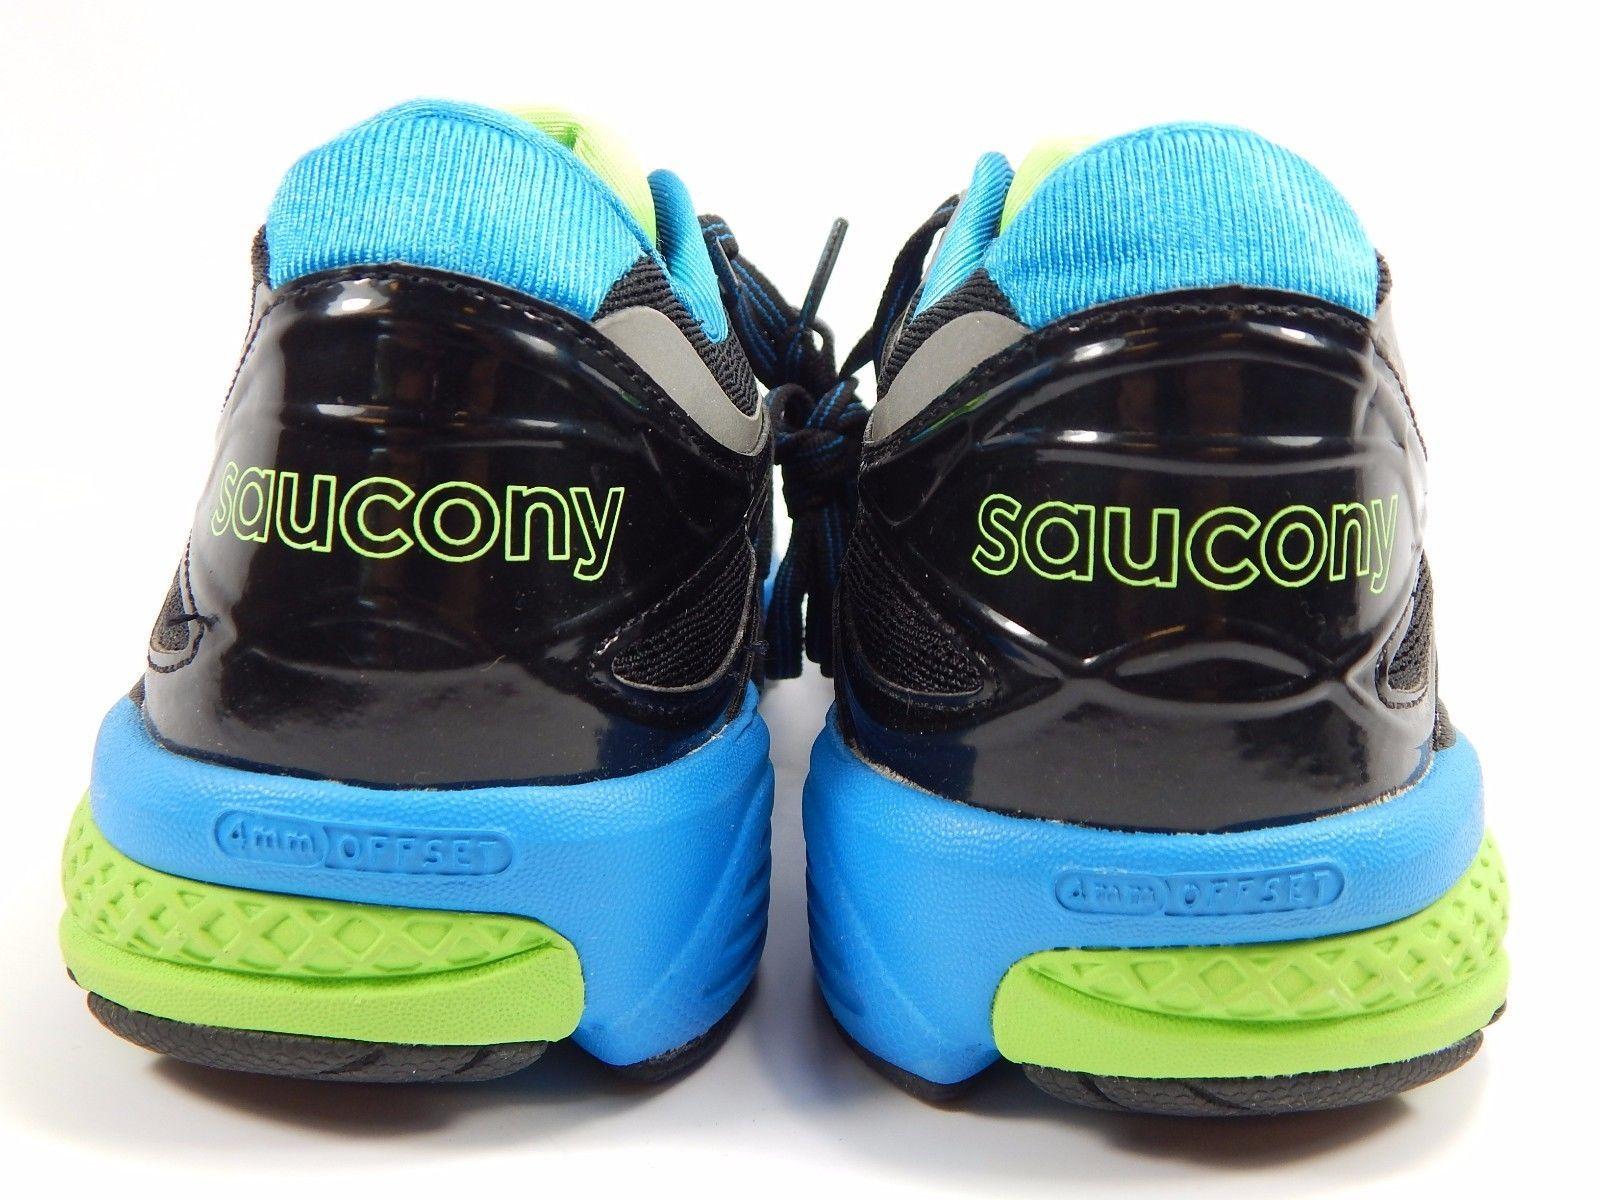 Saucony Zealot ISO 2 Men's Running Shoes Size US 9 M (D) EU 42.5 Silver S20314-1